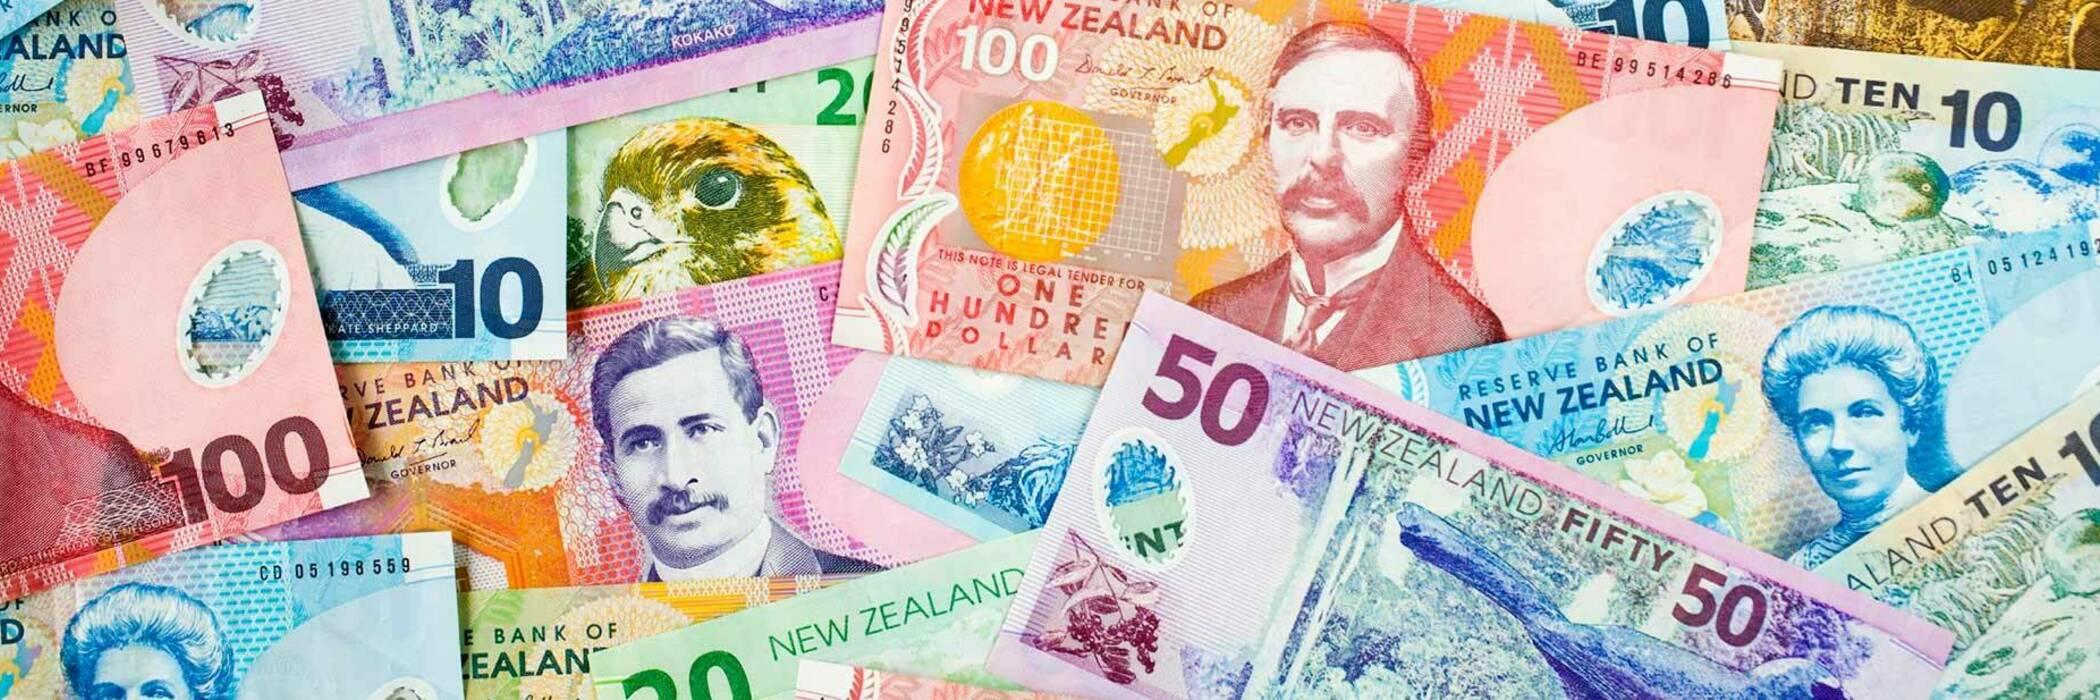 14feb organise your finances hero